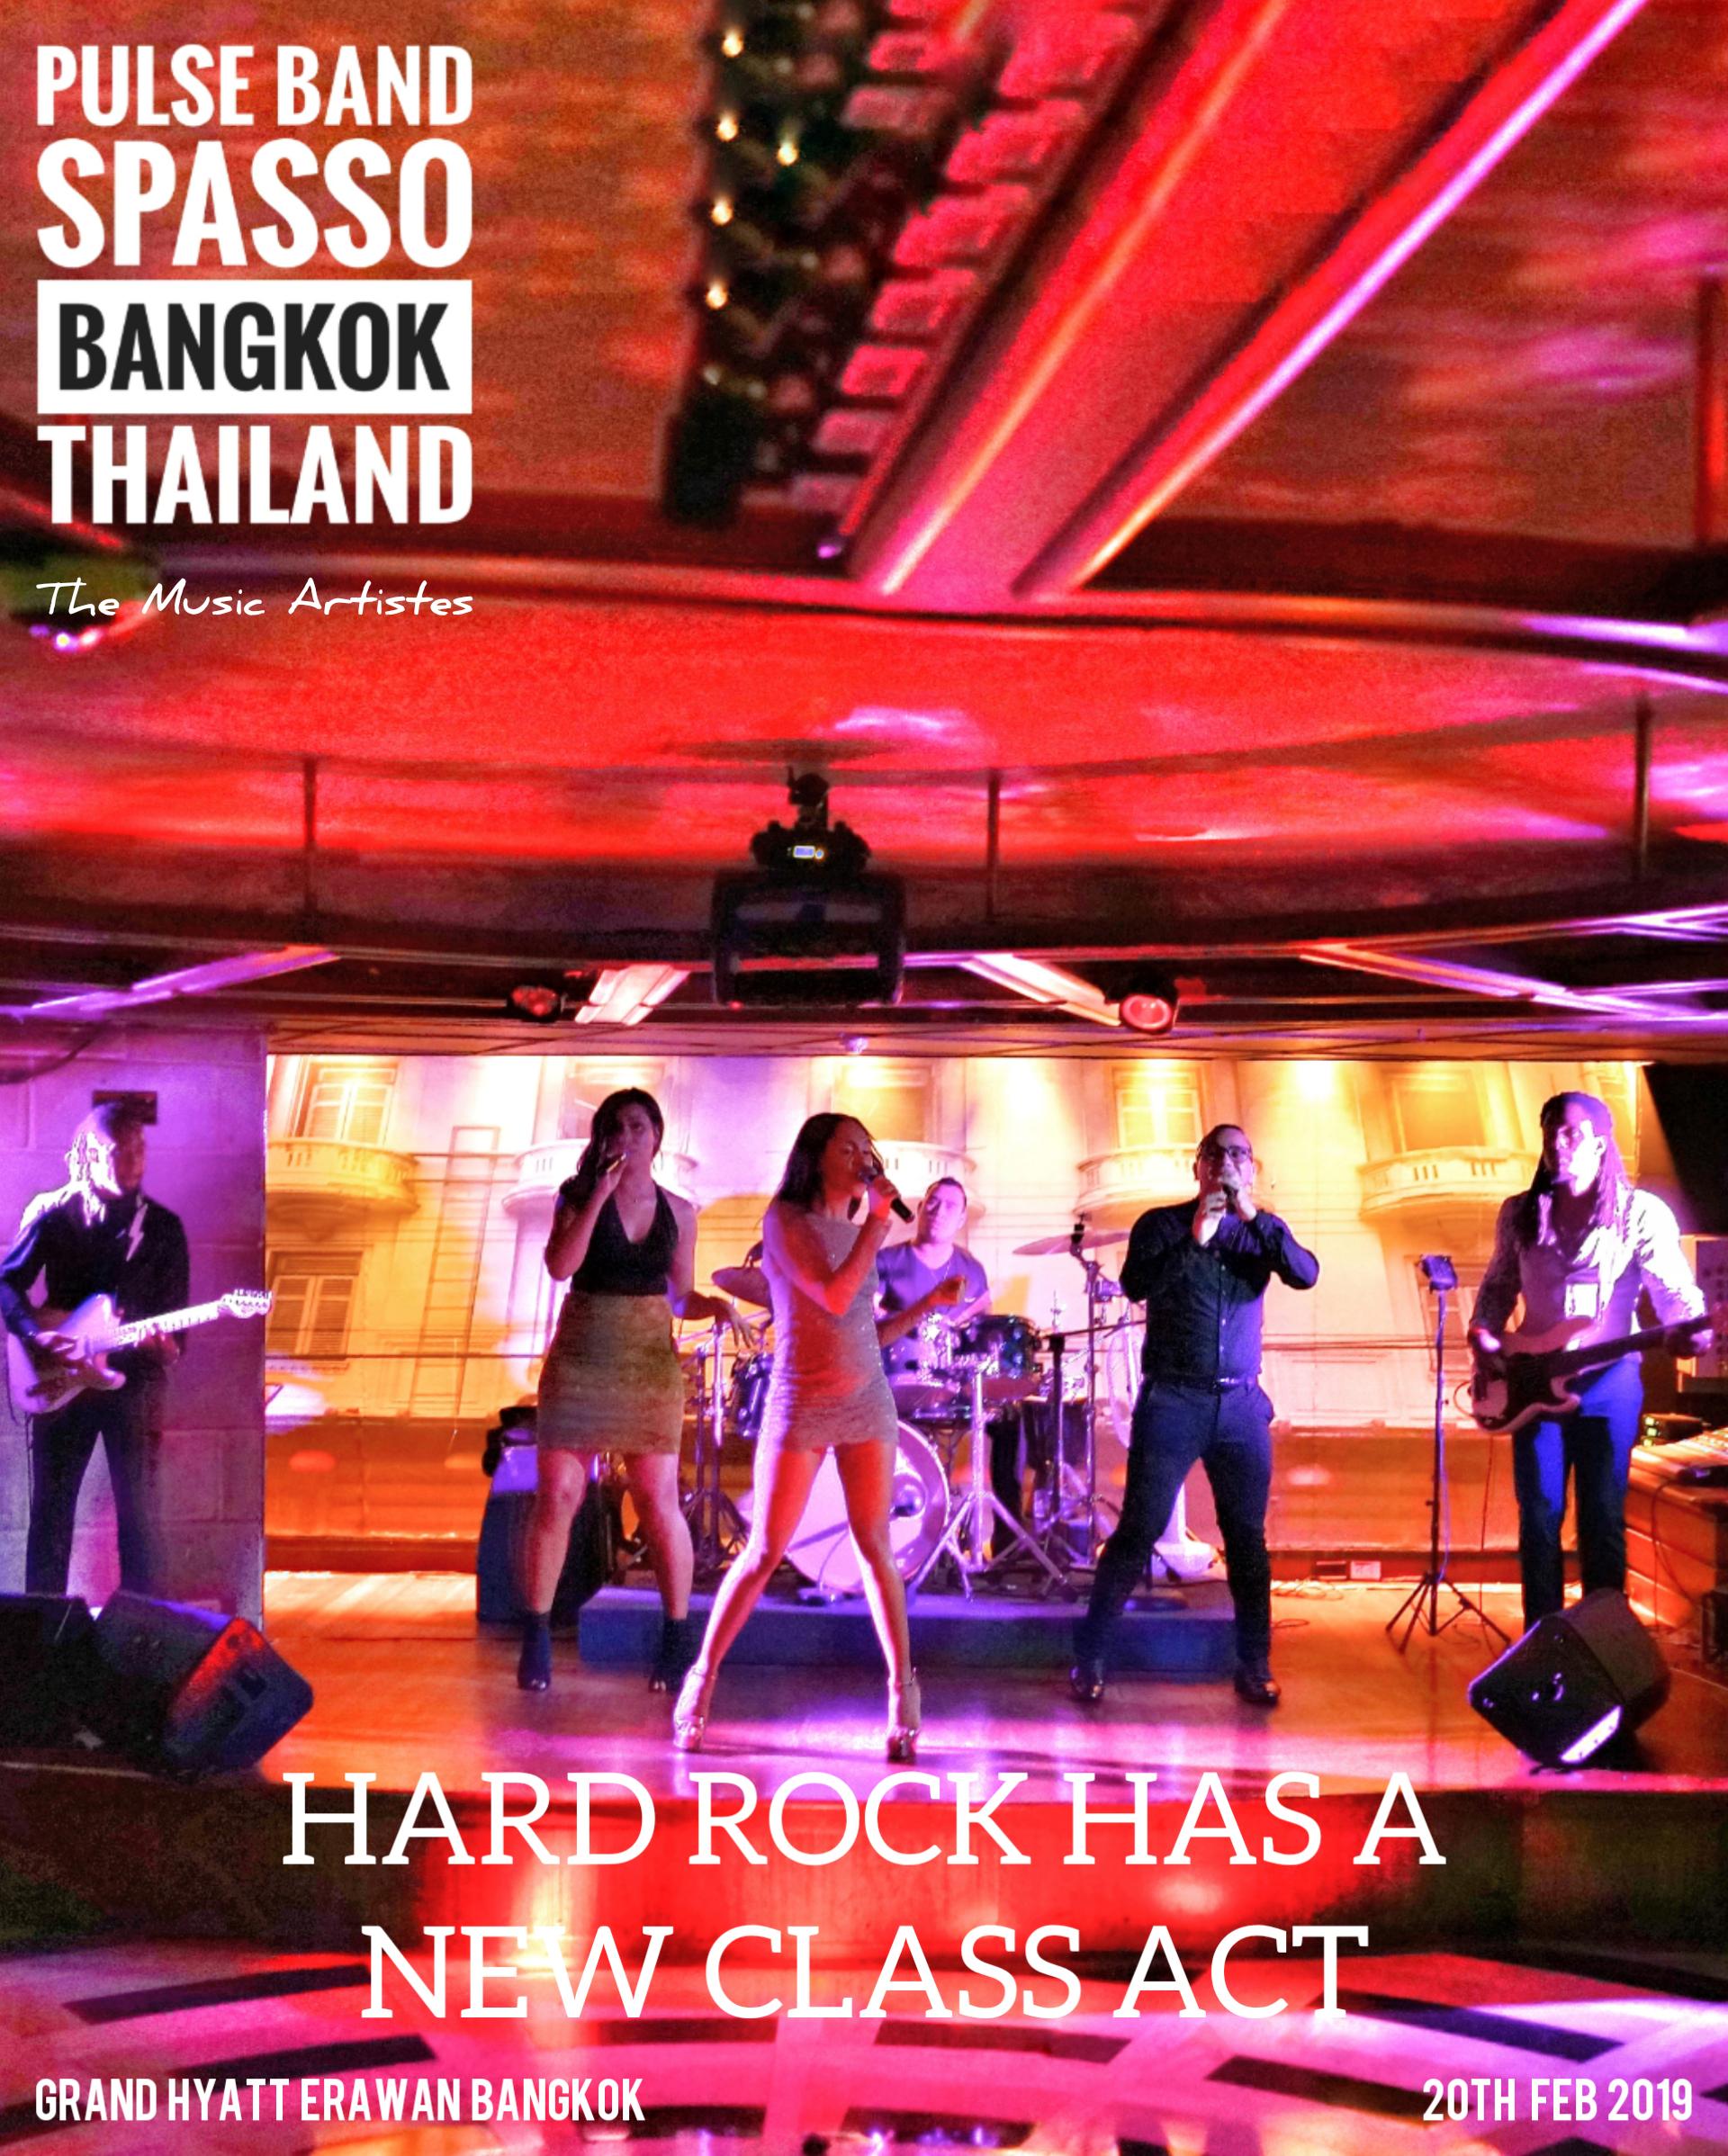 20190220_2326_Thailand_Bangkok_Spasso_Pulse Band_DSC09192_Sony RX1_4x5_4.72mb_@_w